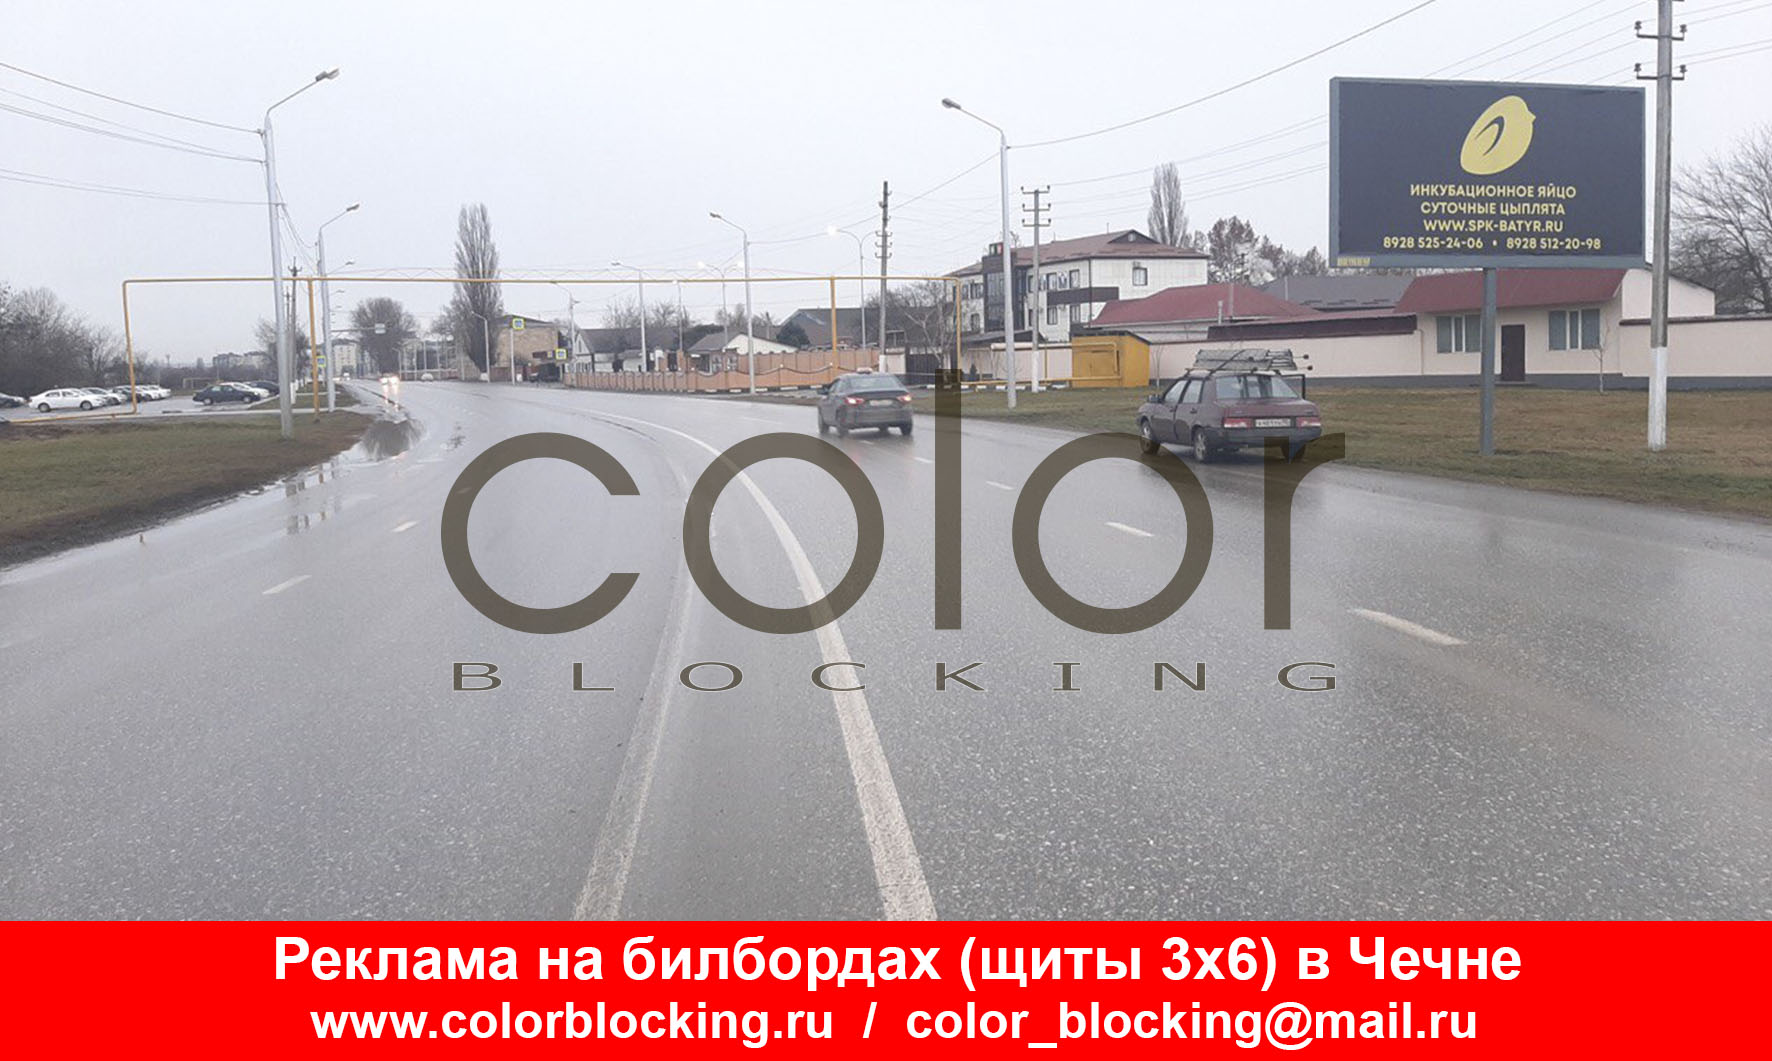 Реклама на билбордах трасса М29 Чечня